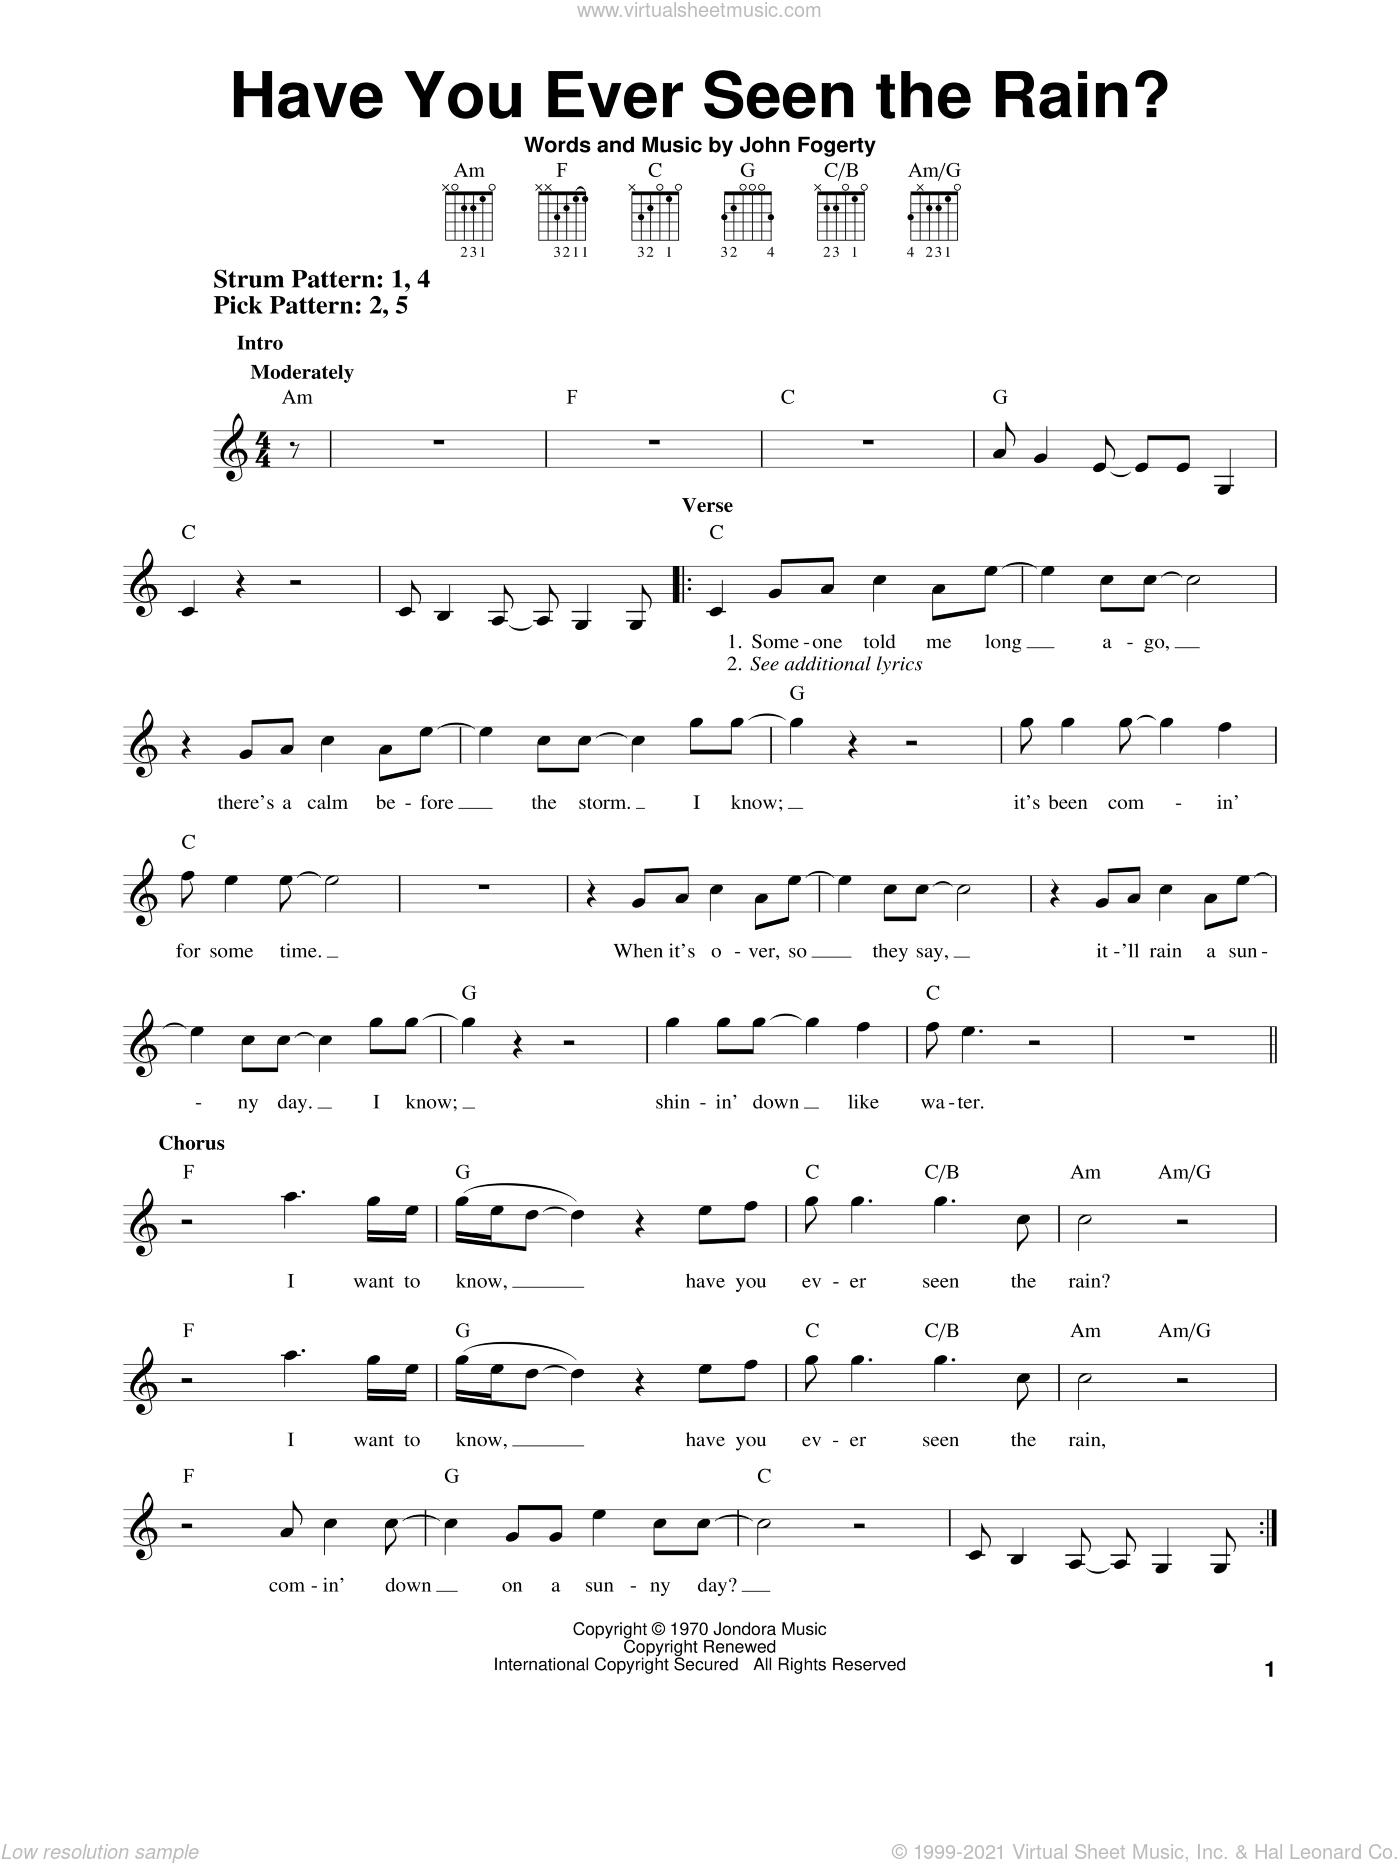 Have you ever seen the rain piano sheet music pdf